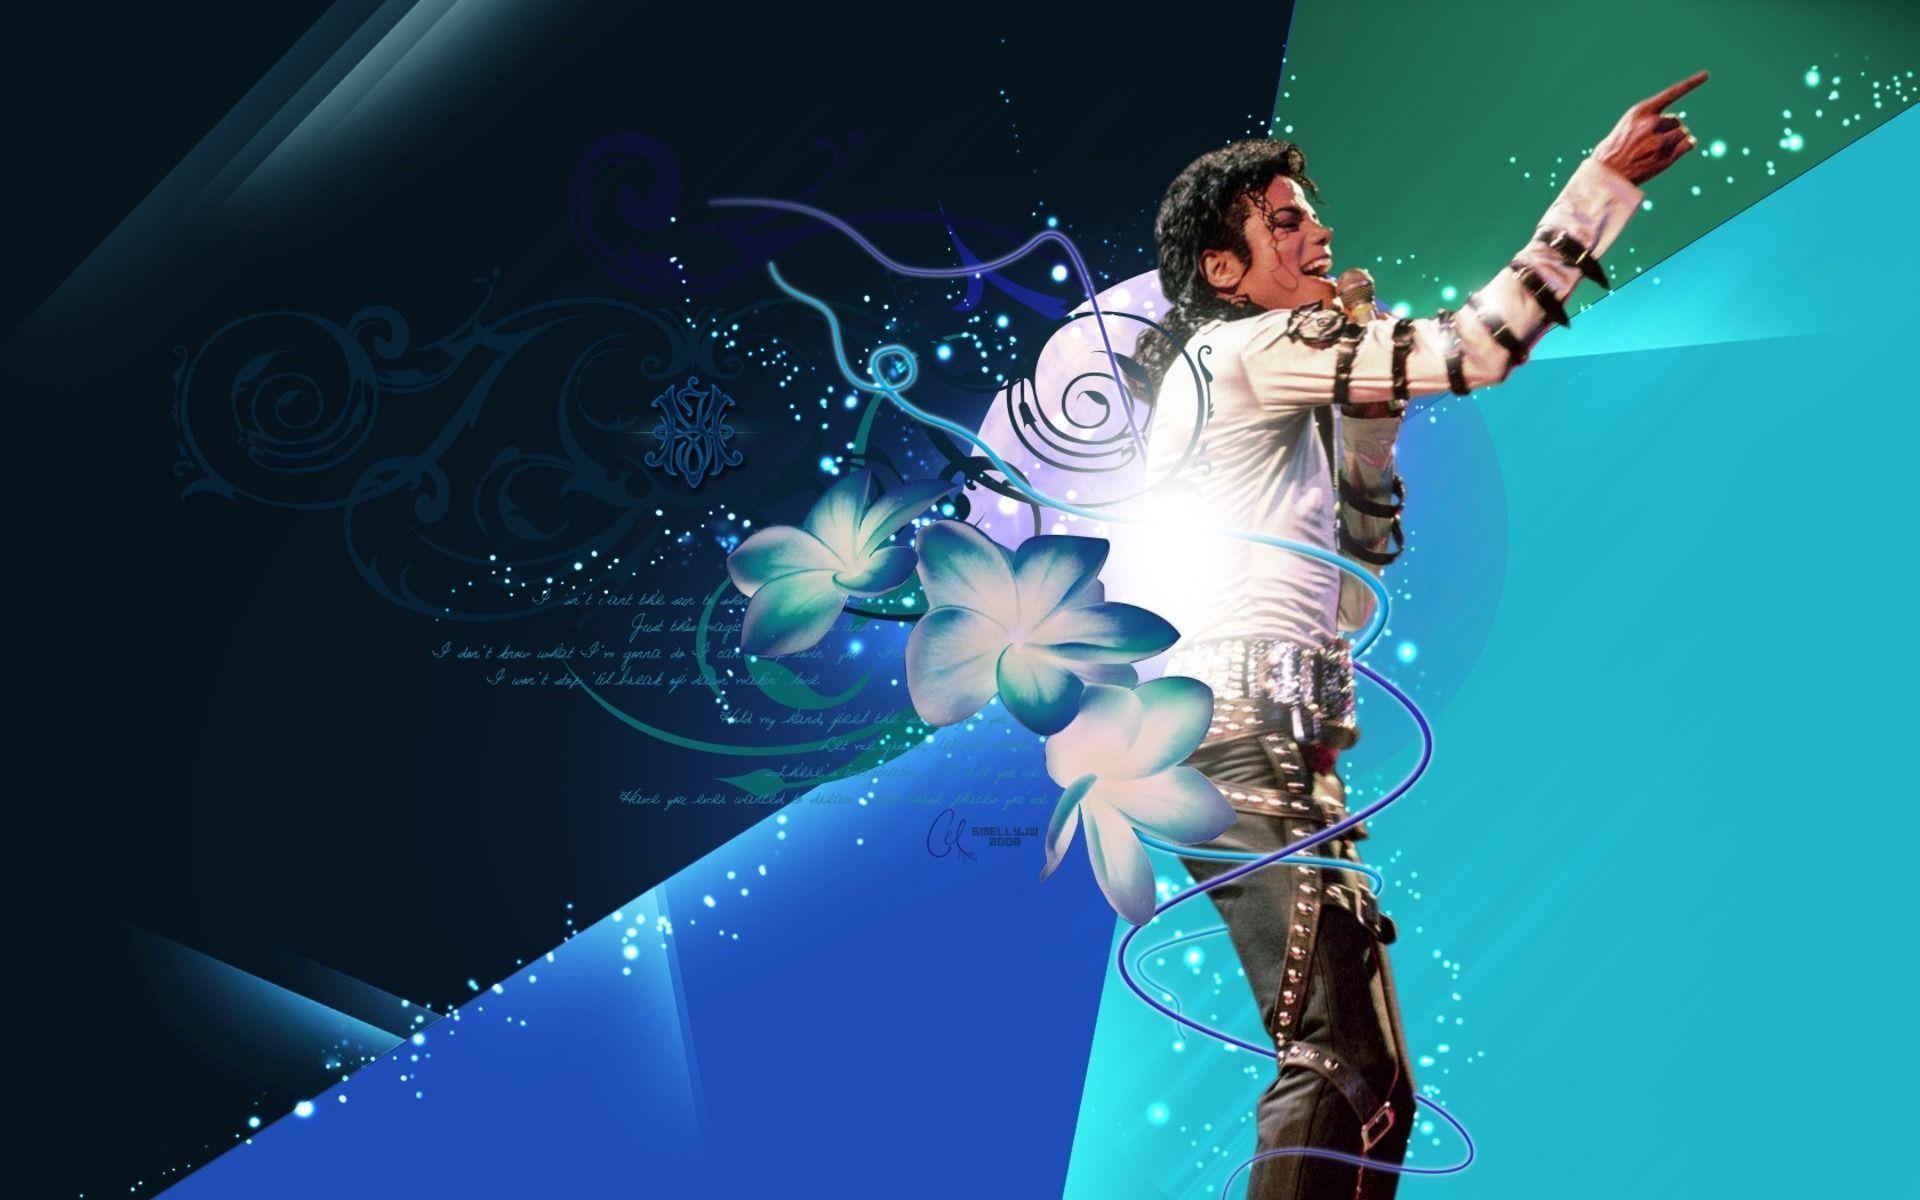 Michael Jackson Wallpapers Hd - 1286739